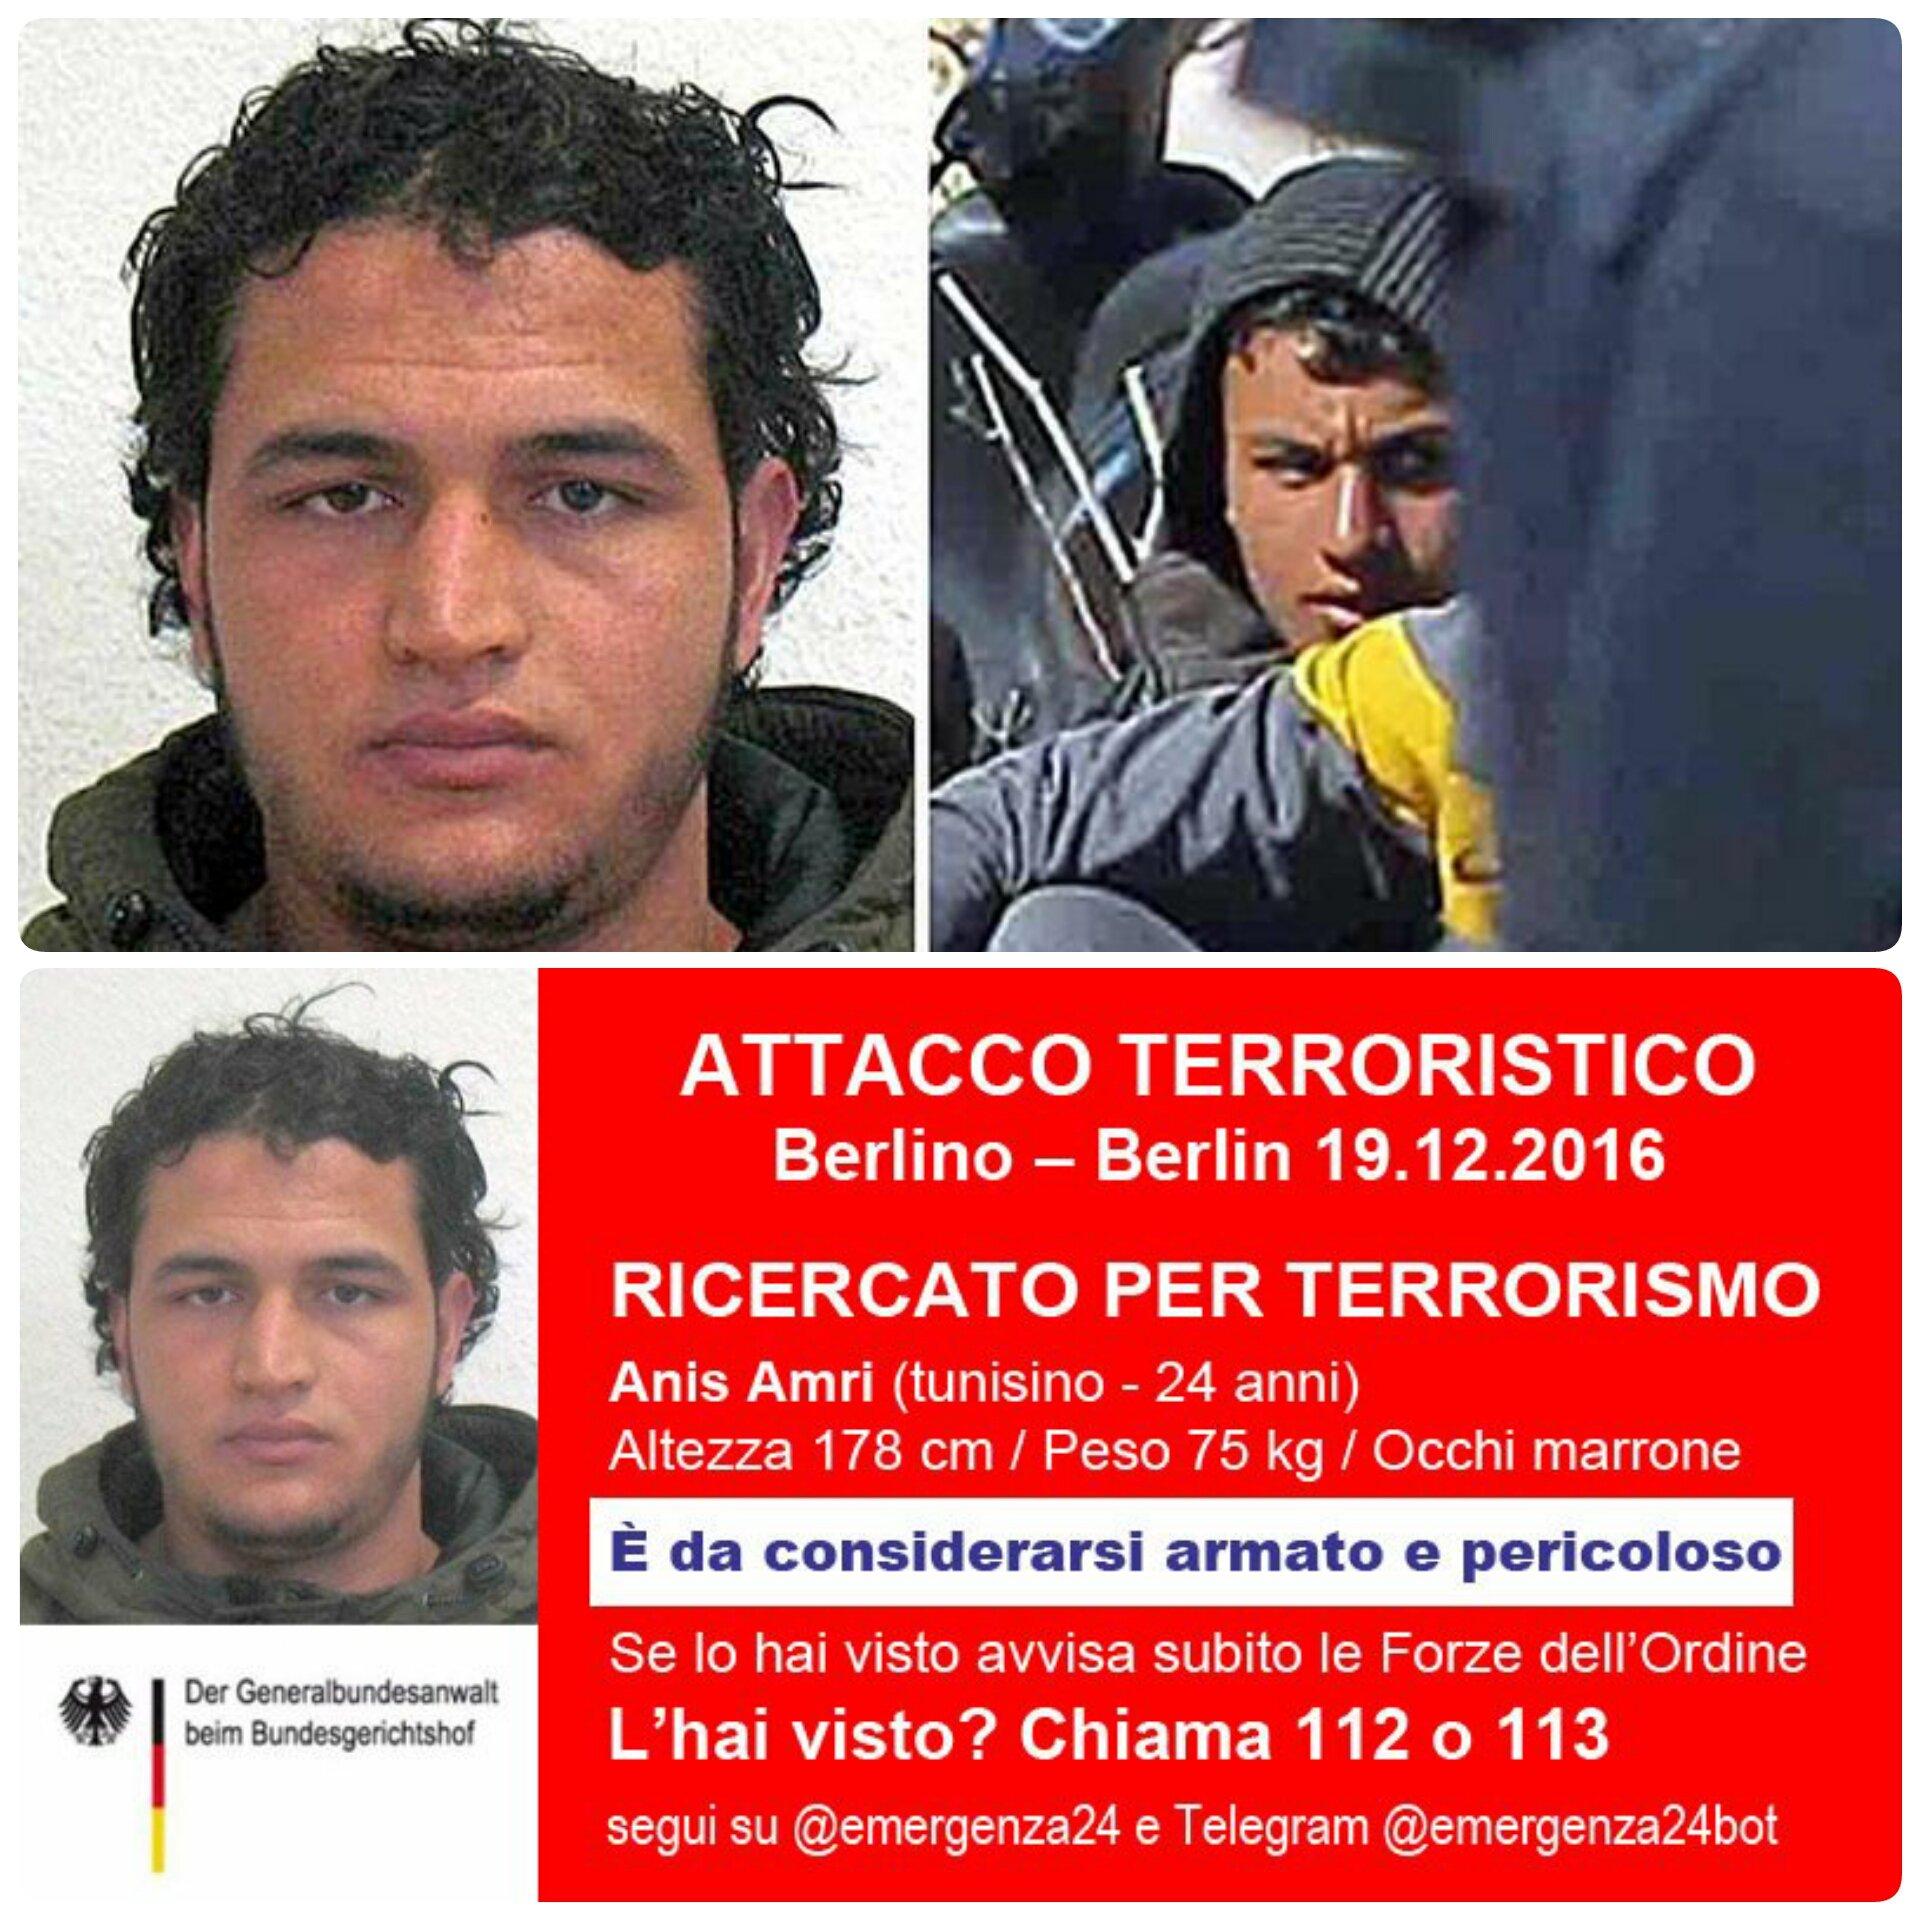 anis-amri-suspeito-tunisino-do-atentado-de-berlim